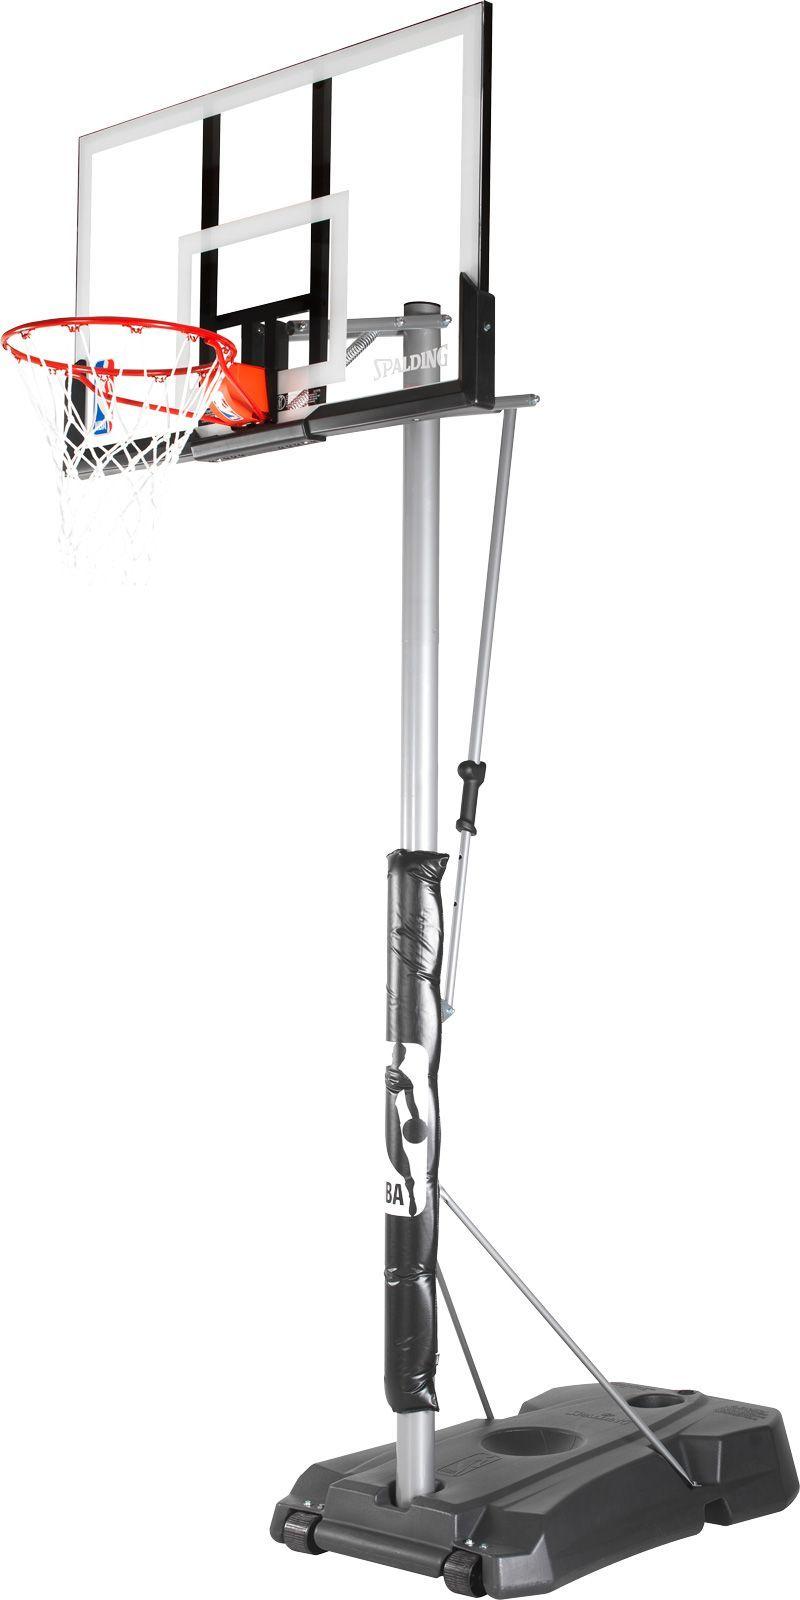 Spalding Hercules 52â Acrylic Portable Basketball Hoop